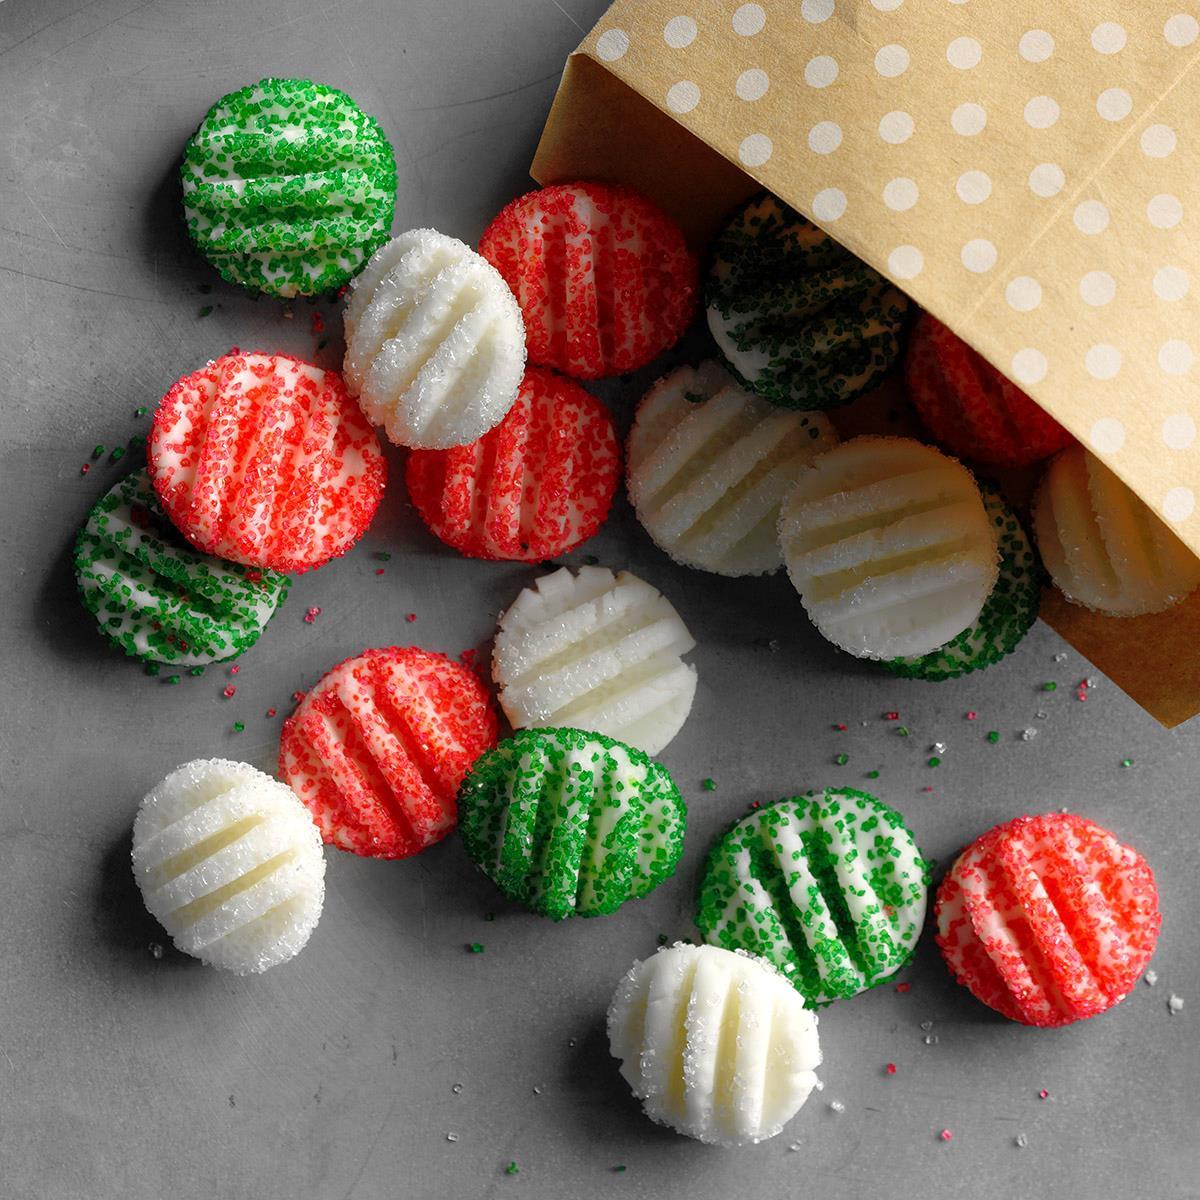 Popular Christmas Candy  Top 10 Homemade Christmas Candy Recipes